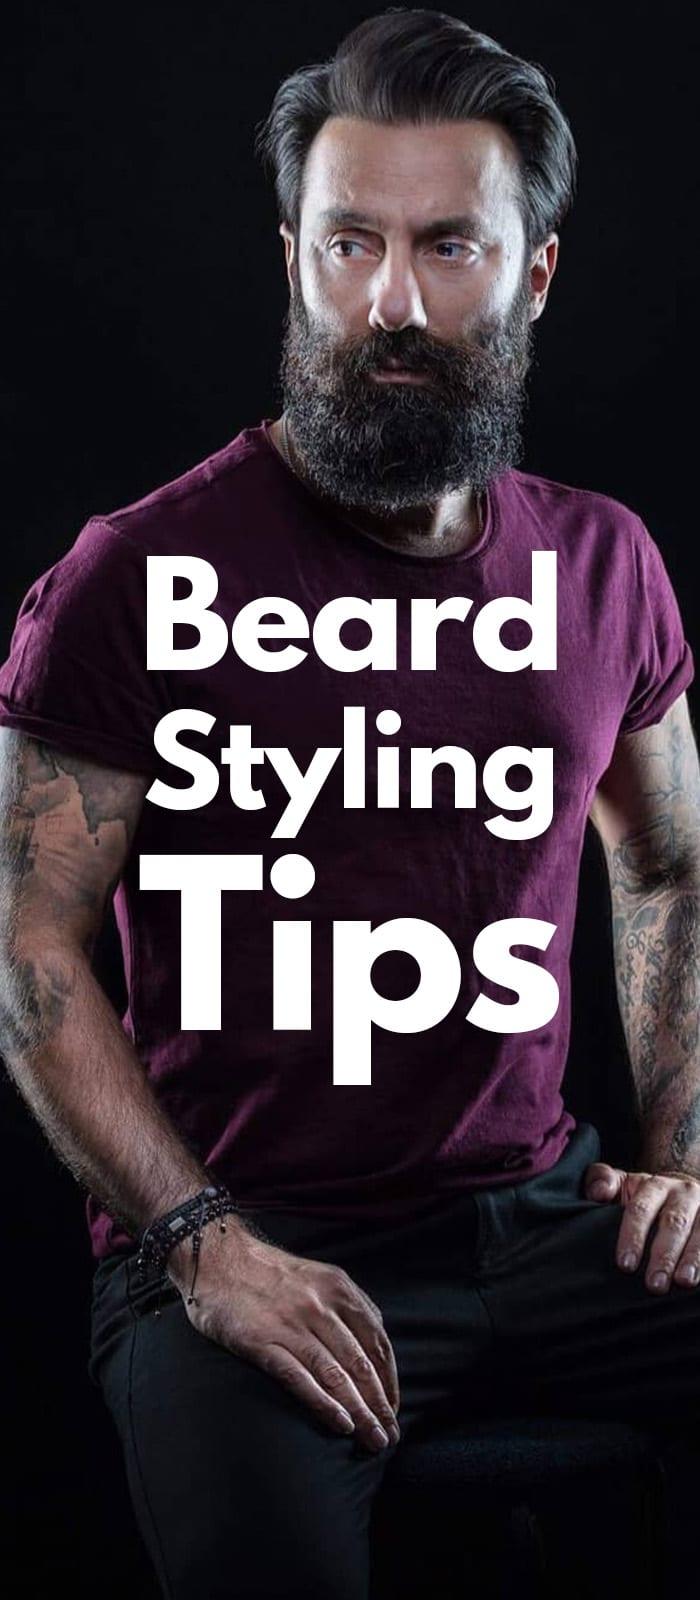 Beard Styling Tips